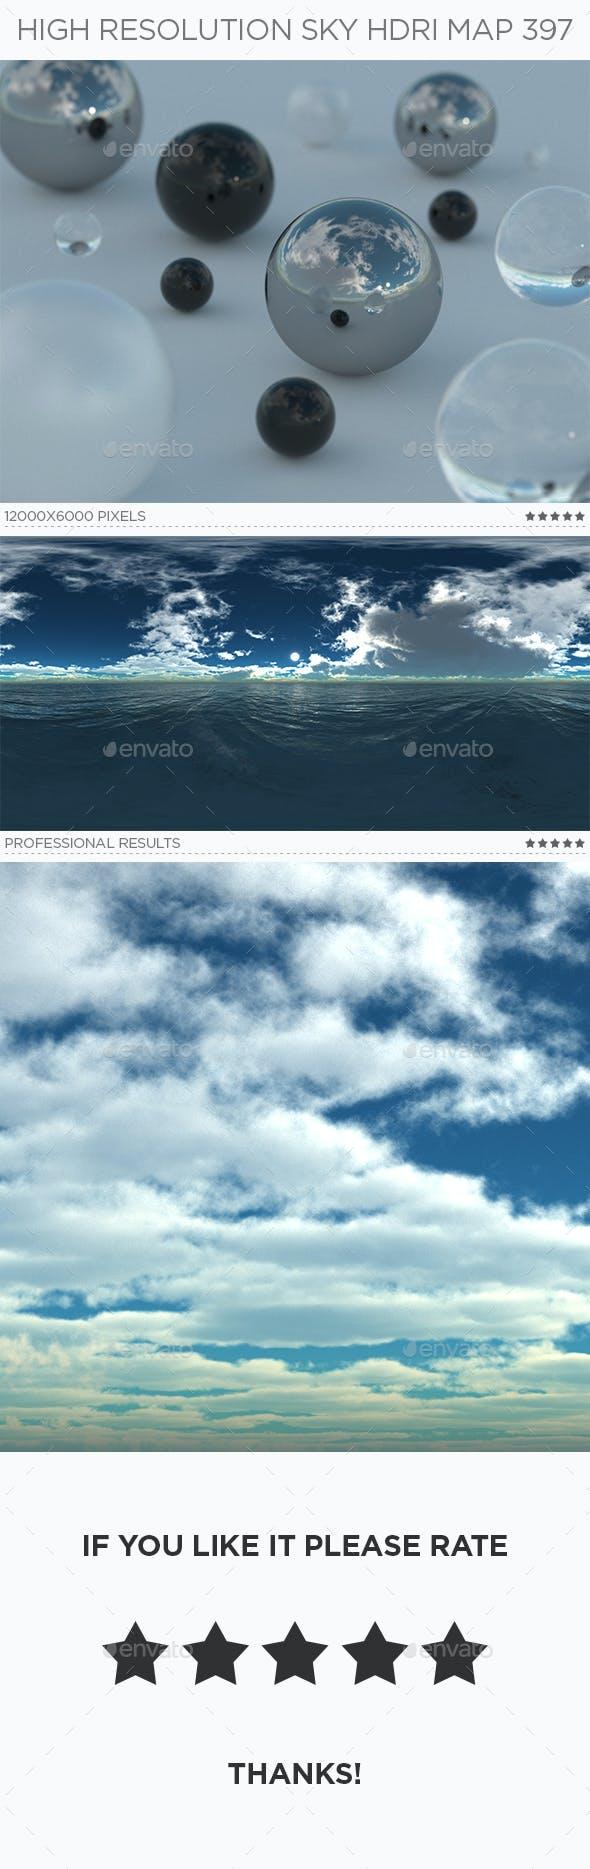 High Resolution Sky HDRi Map 397 - 3DOcean Item for Sale